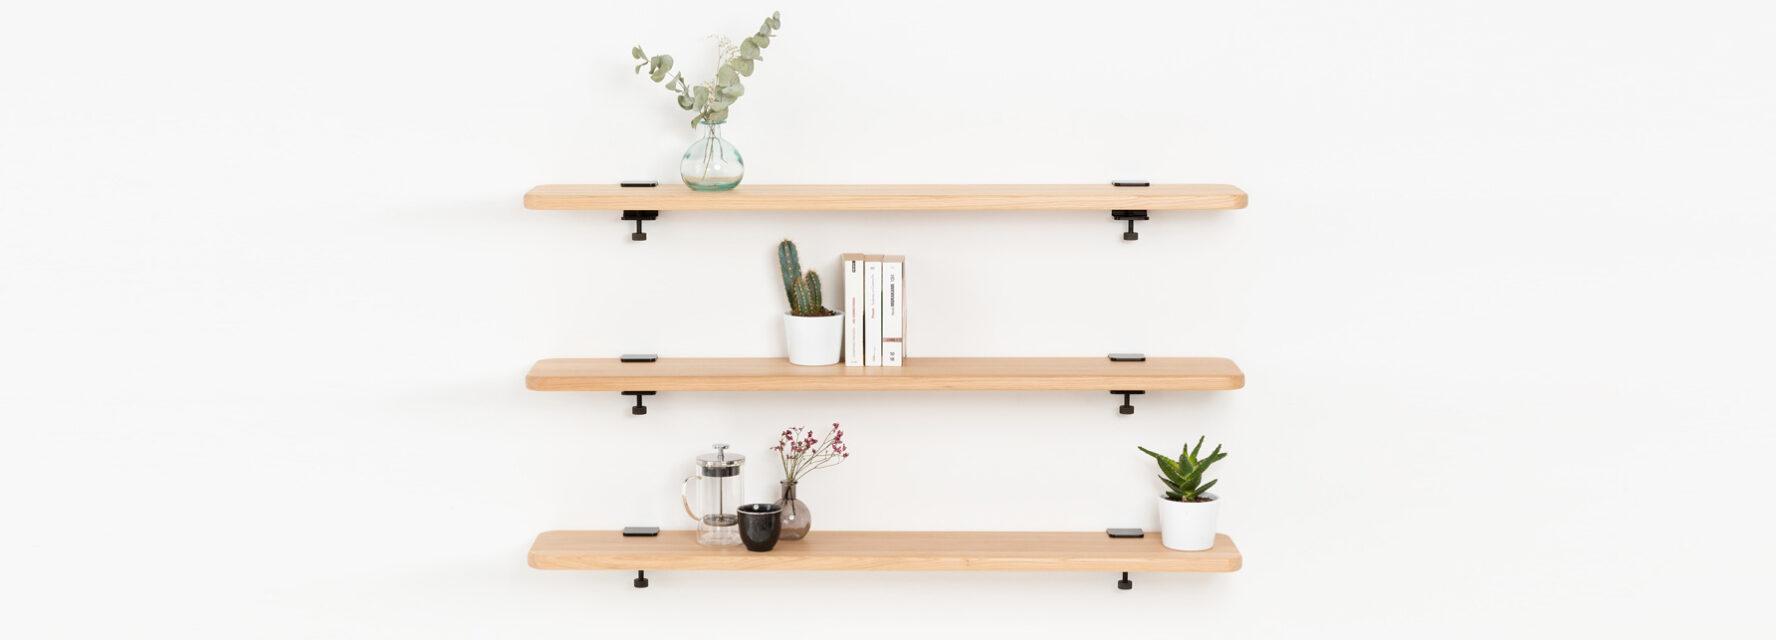 Wall-mounted Bookshelves - TIPTOE